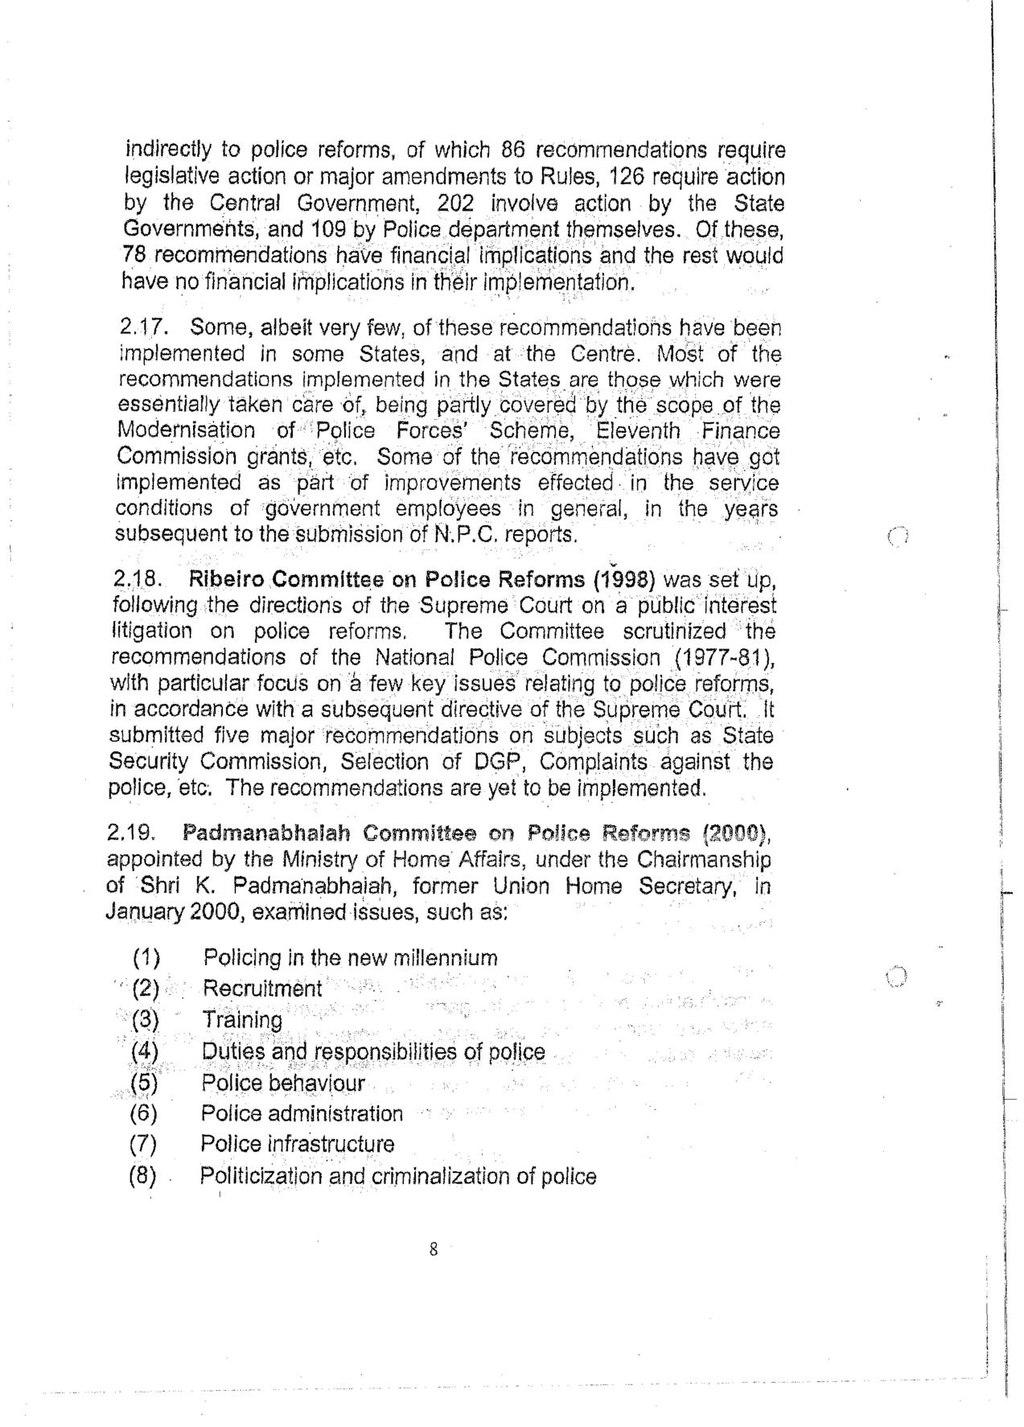 Padmanabhaiah committee report on police reforms in america